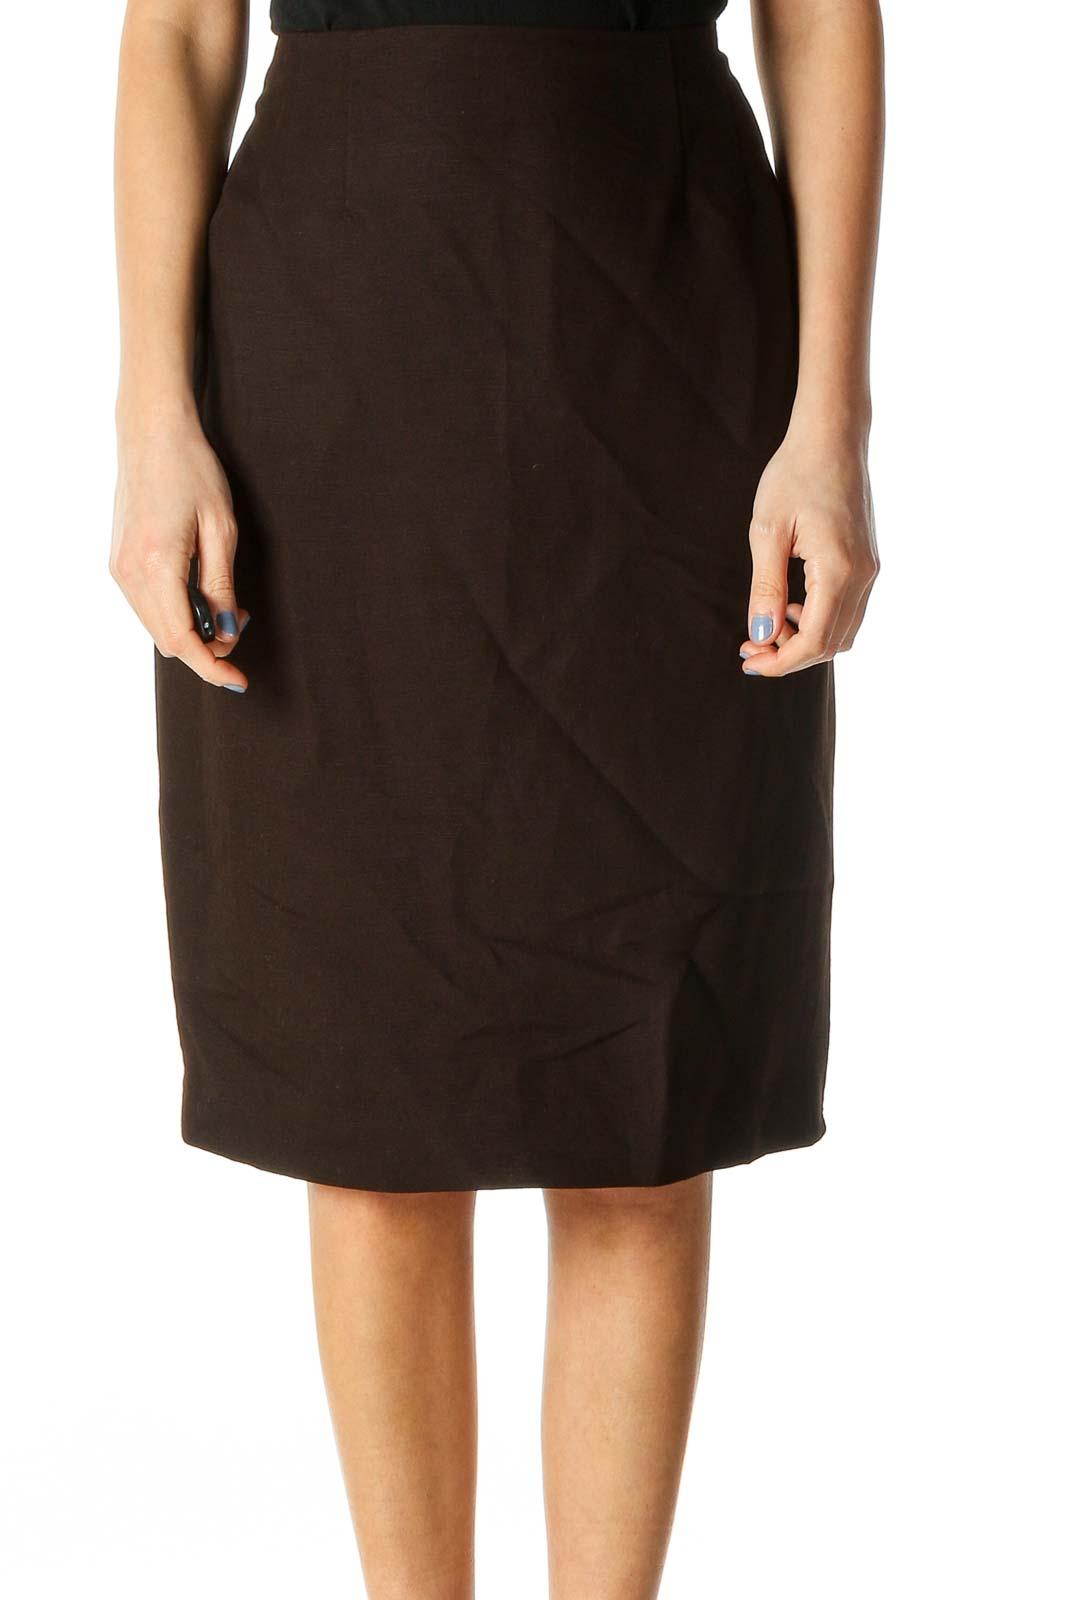 Black Pencil Skirt Front